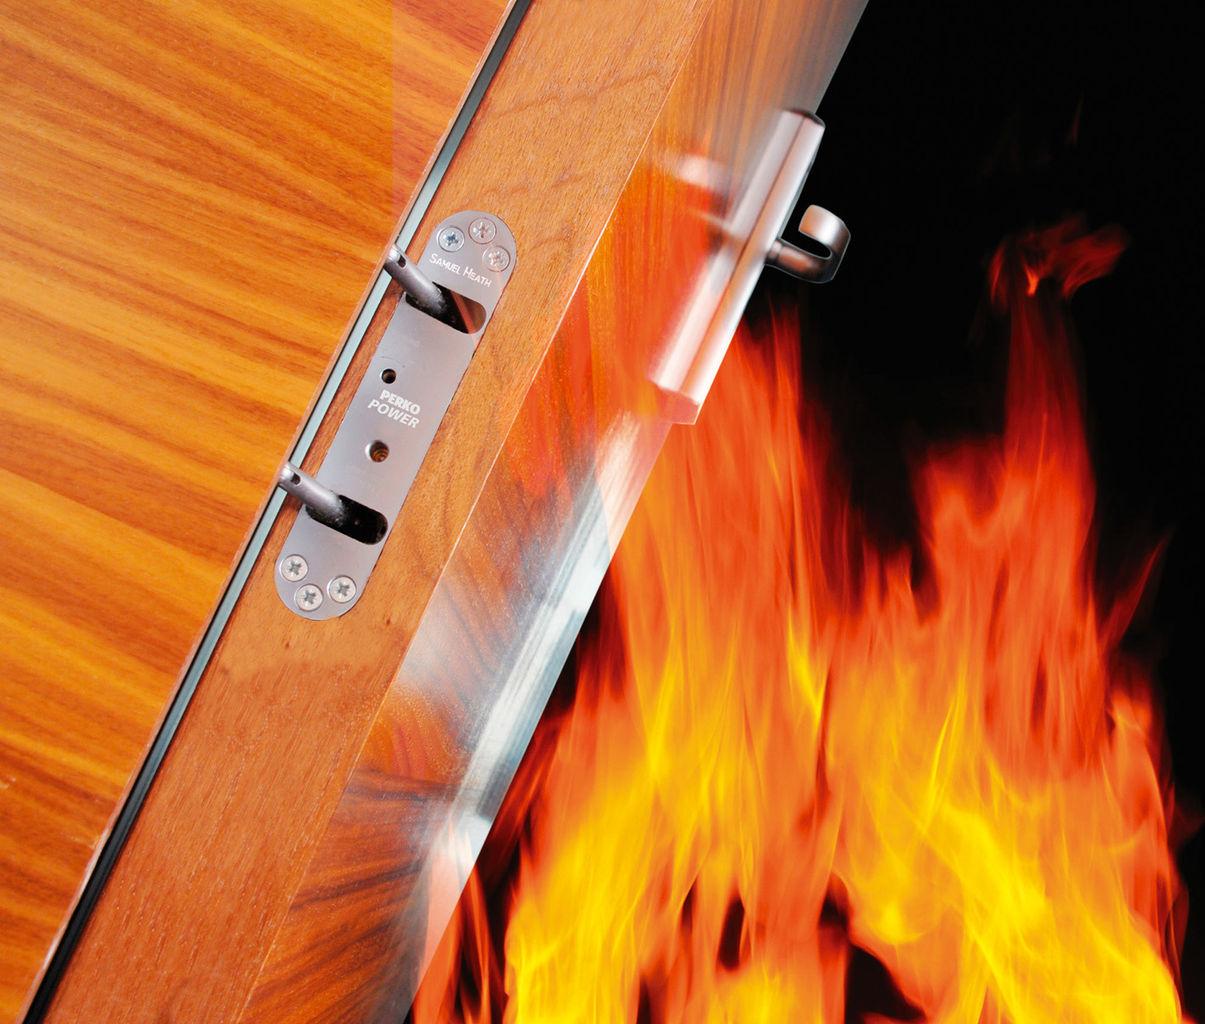 fire door assessment